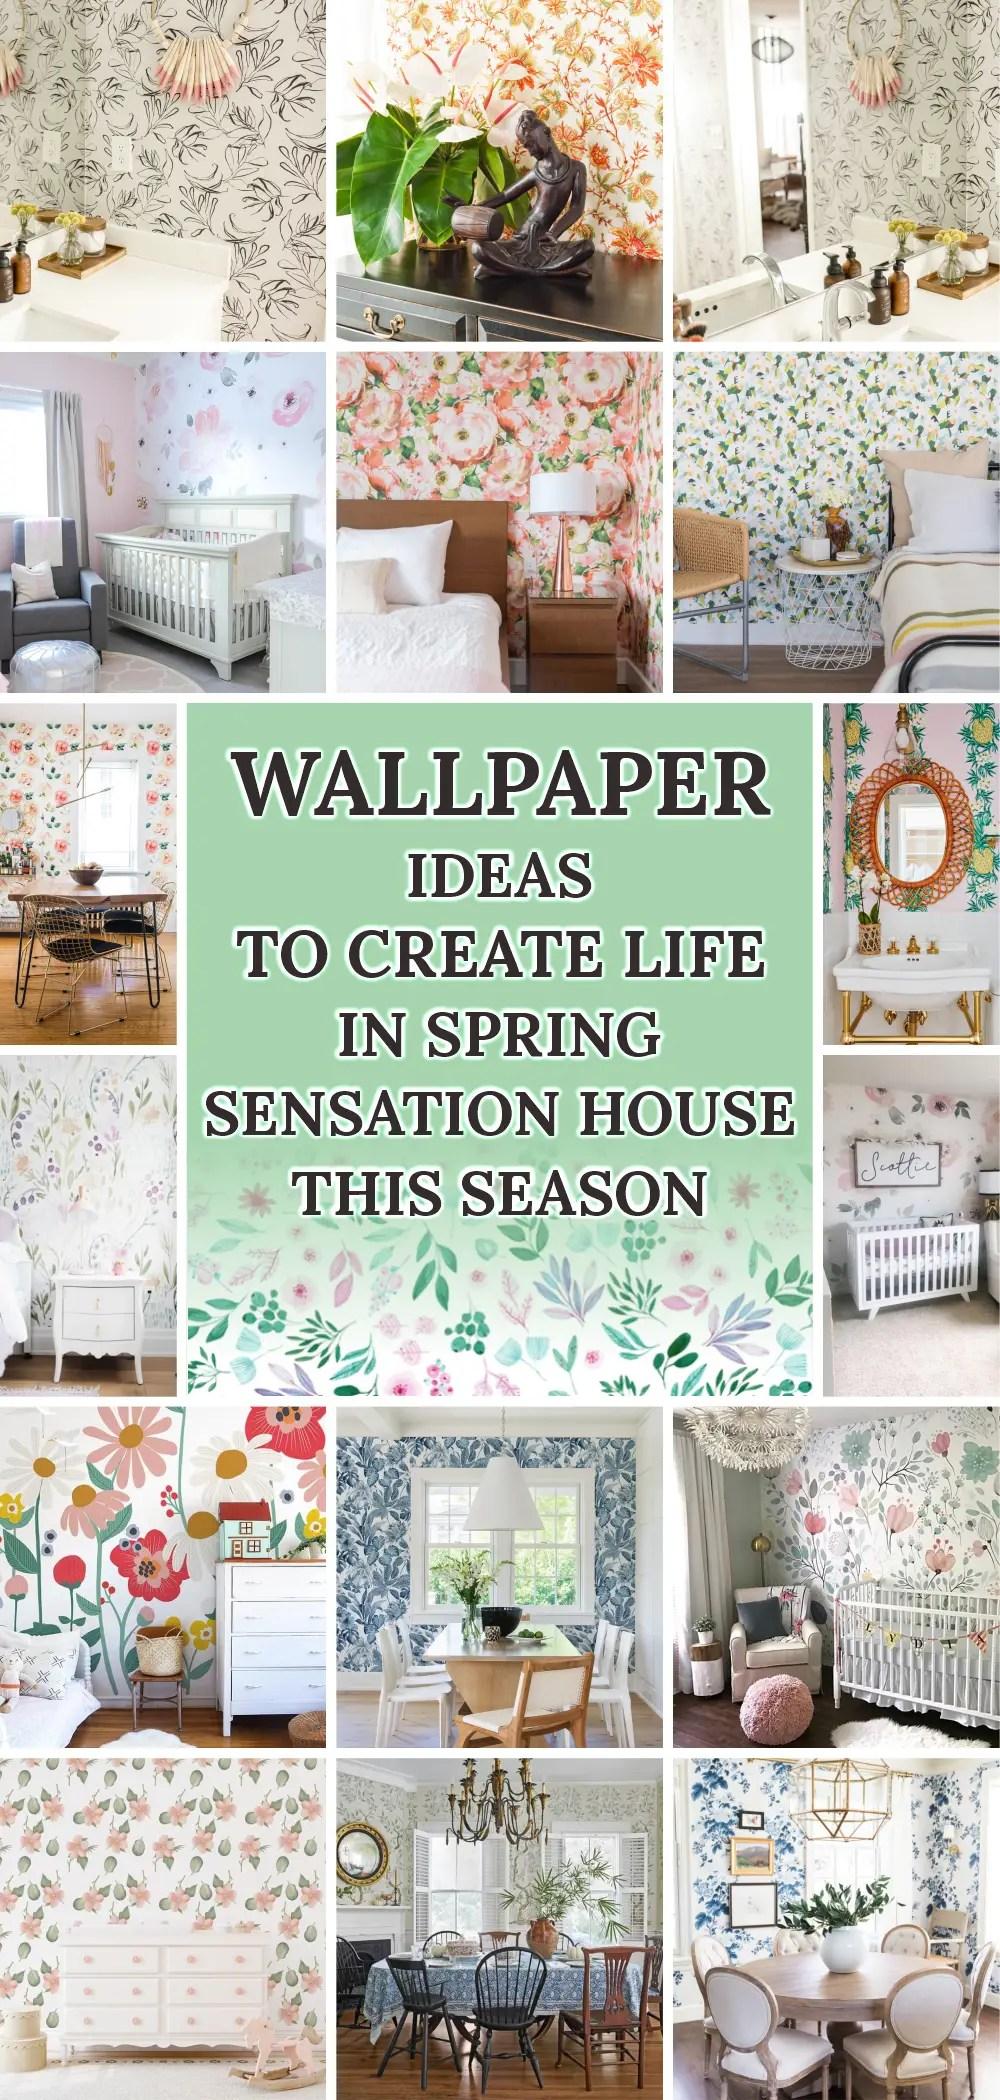 Wallpaper-ideas-to-create-life-in-spring-sensation-house-this-season-1